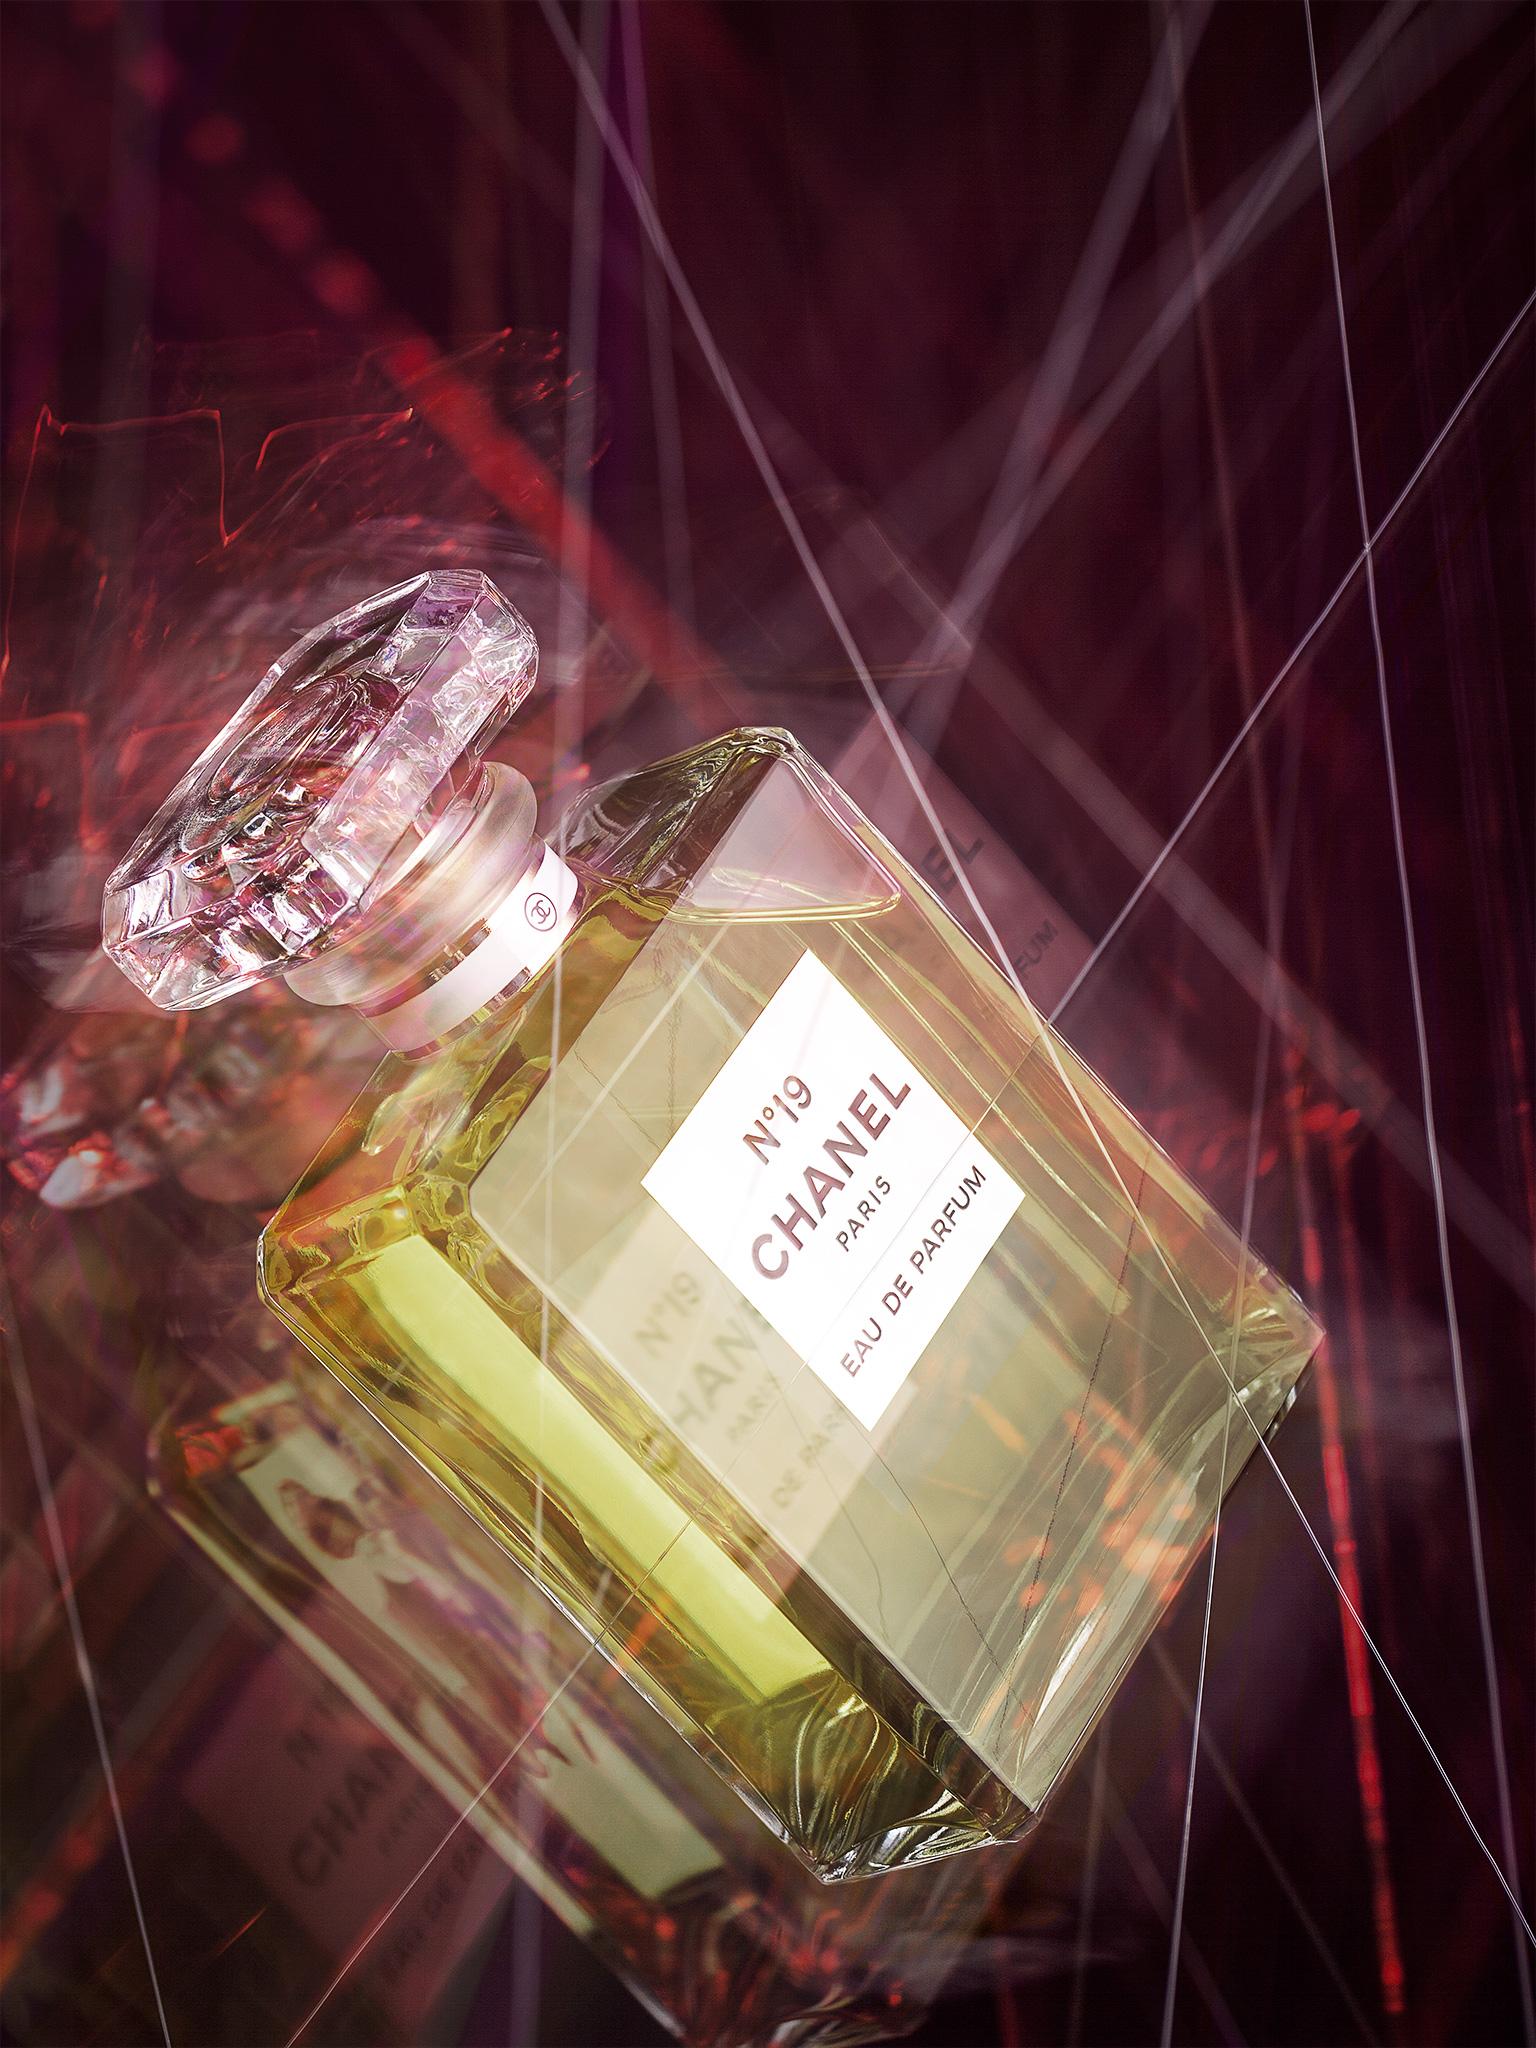 1804_Chanel_Blur.jpg